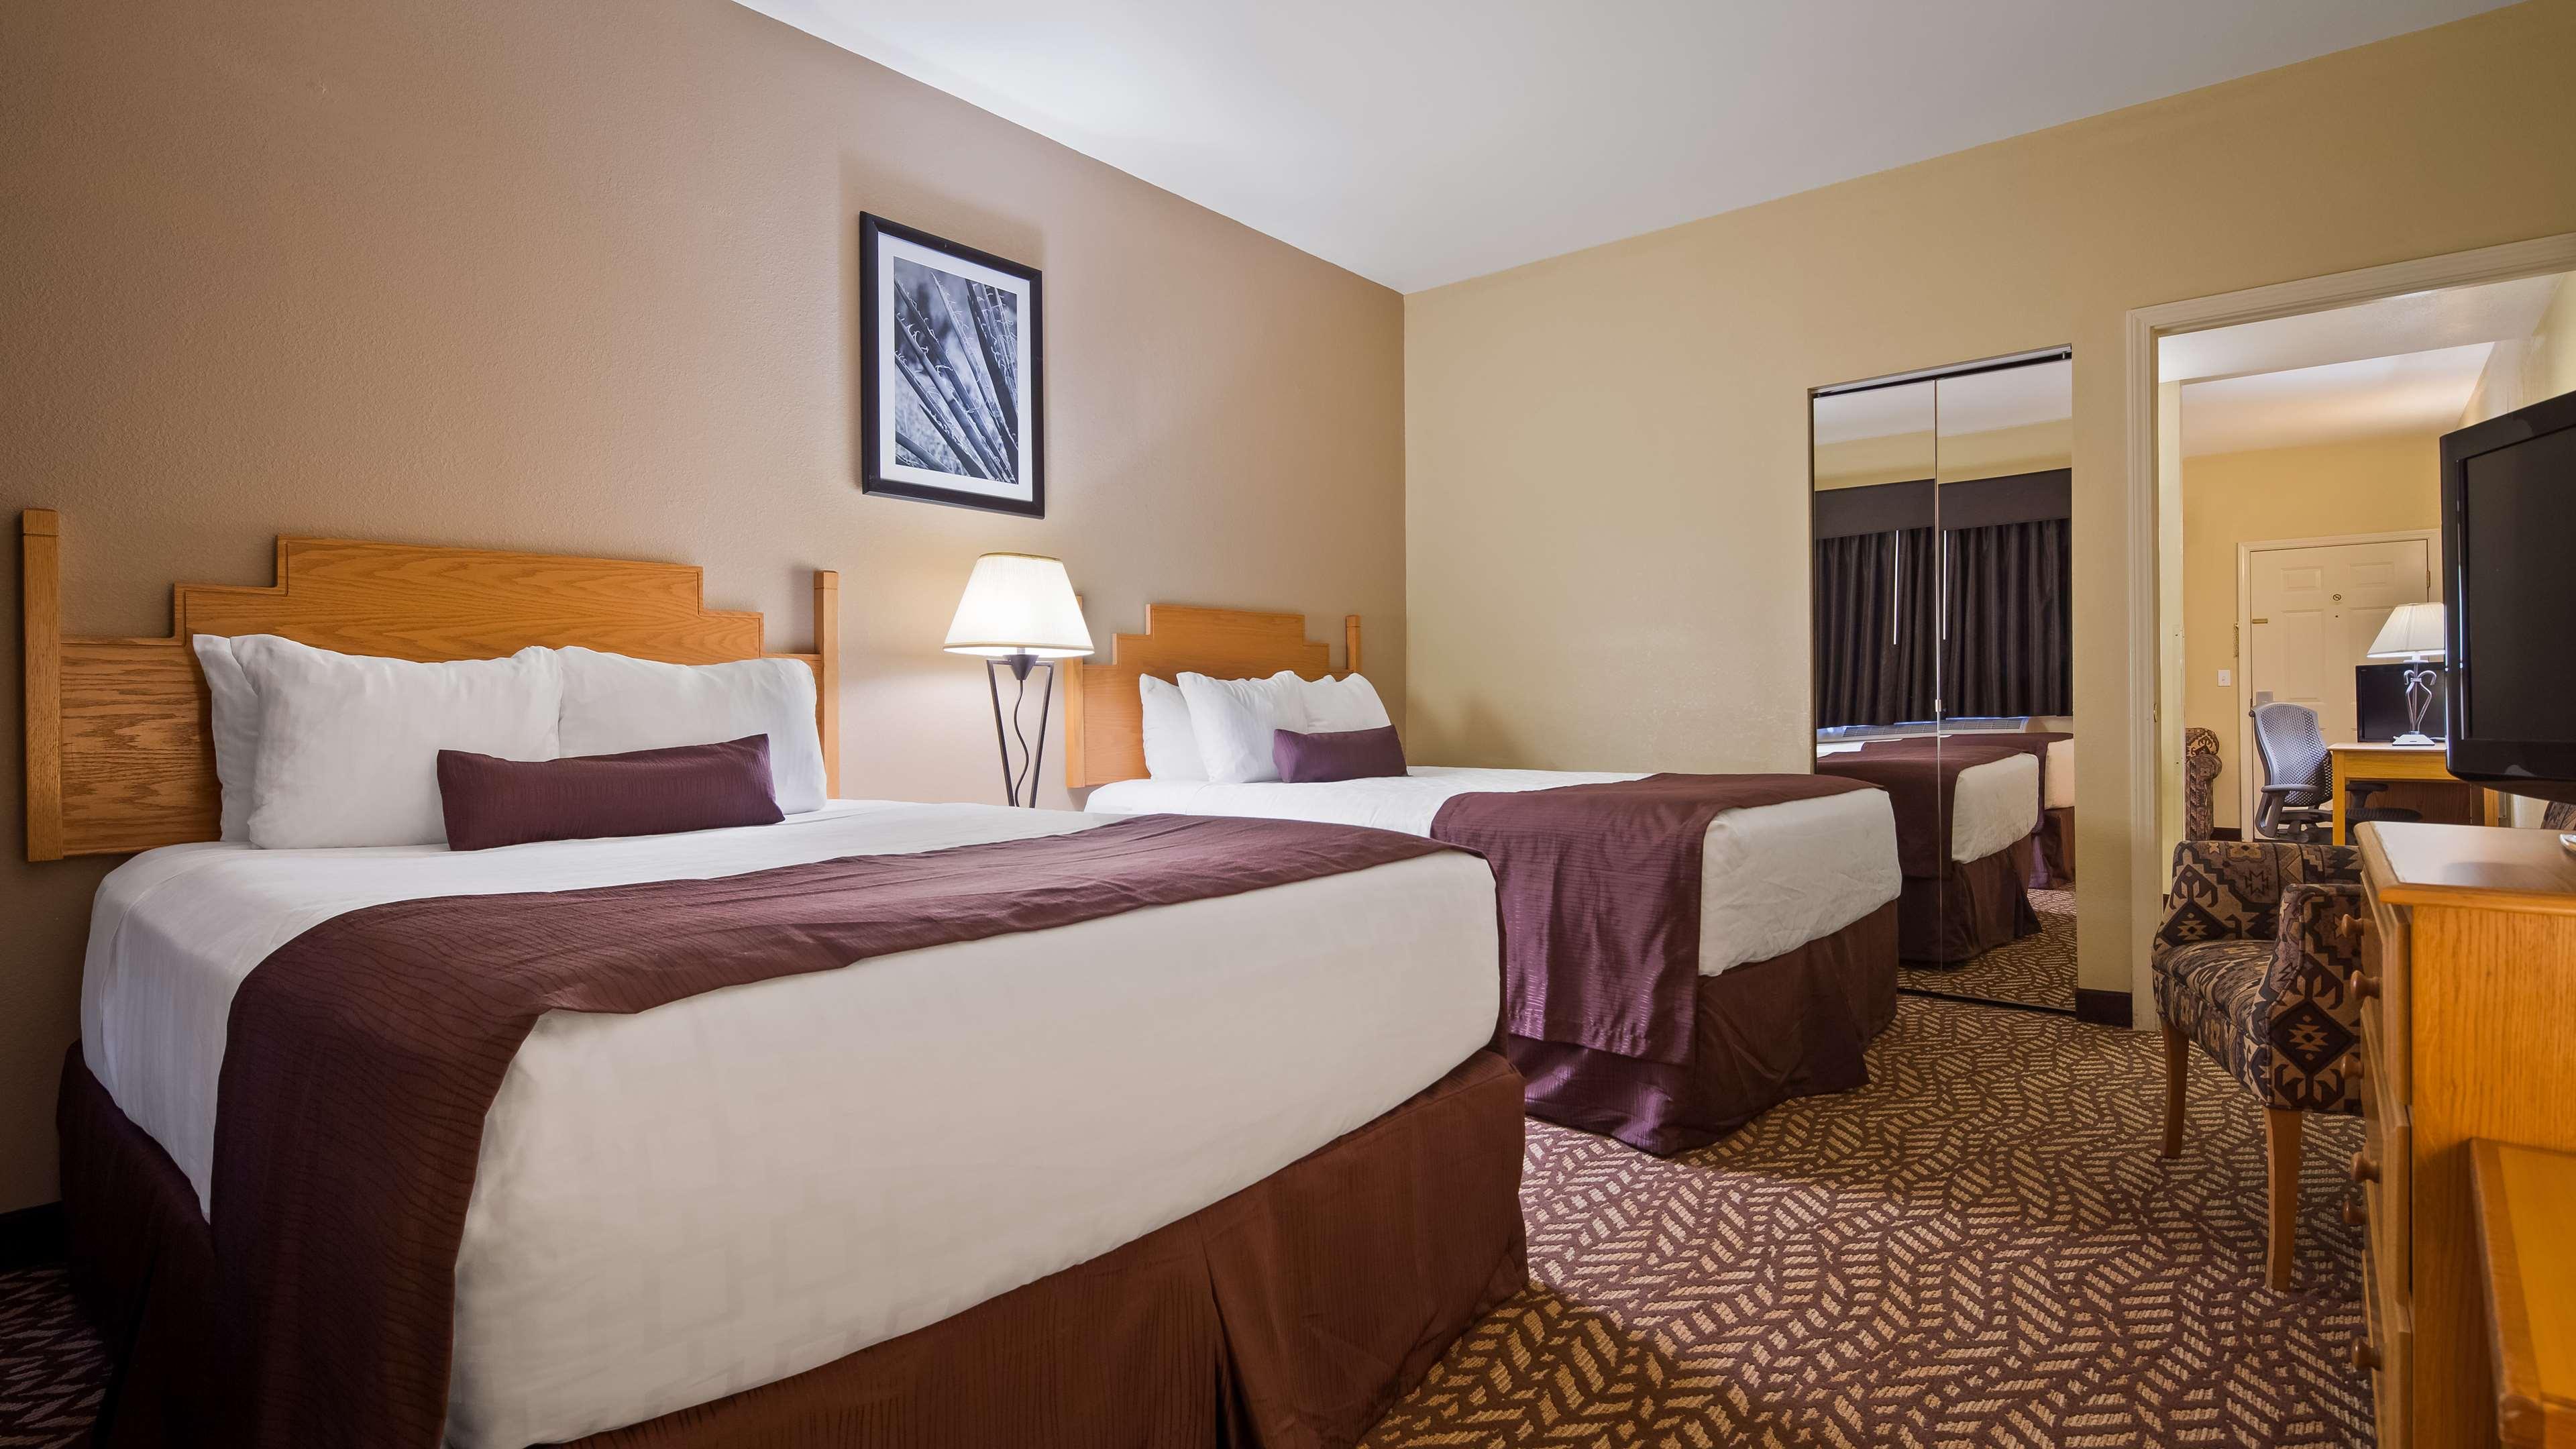 Best Western Turquoise Inn & Suites image 19